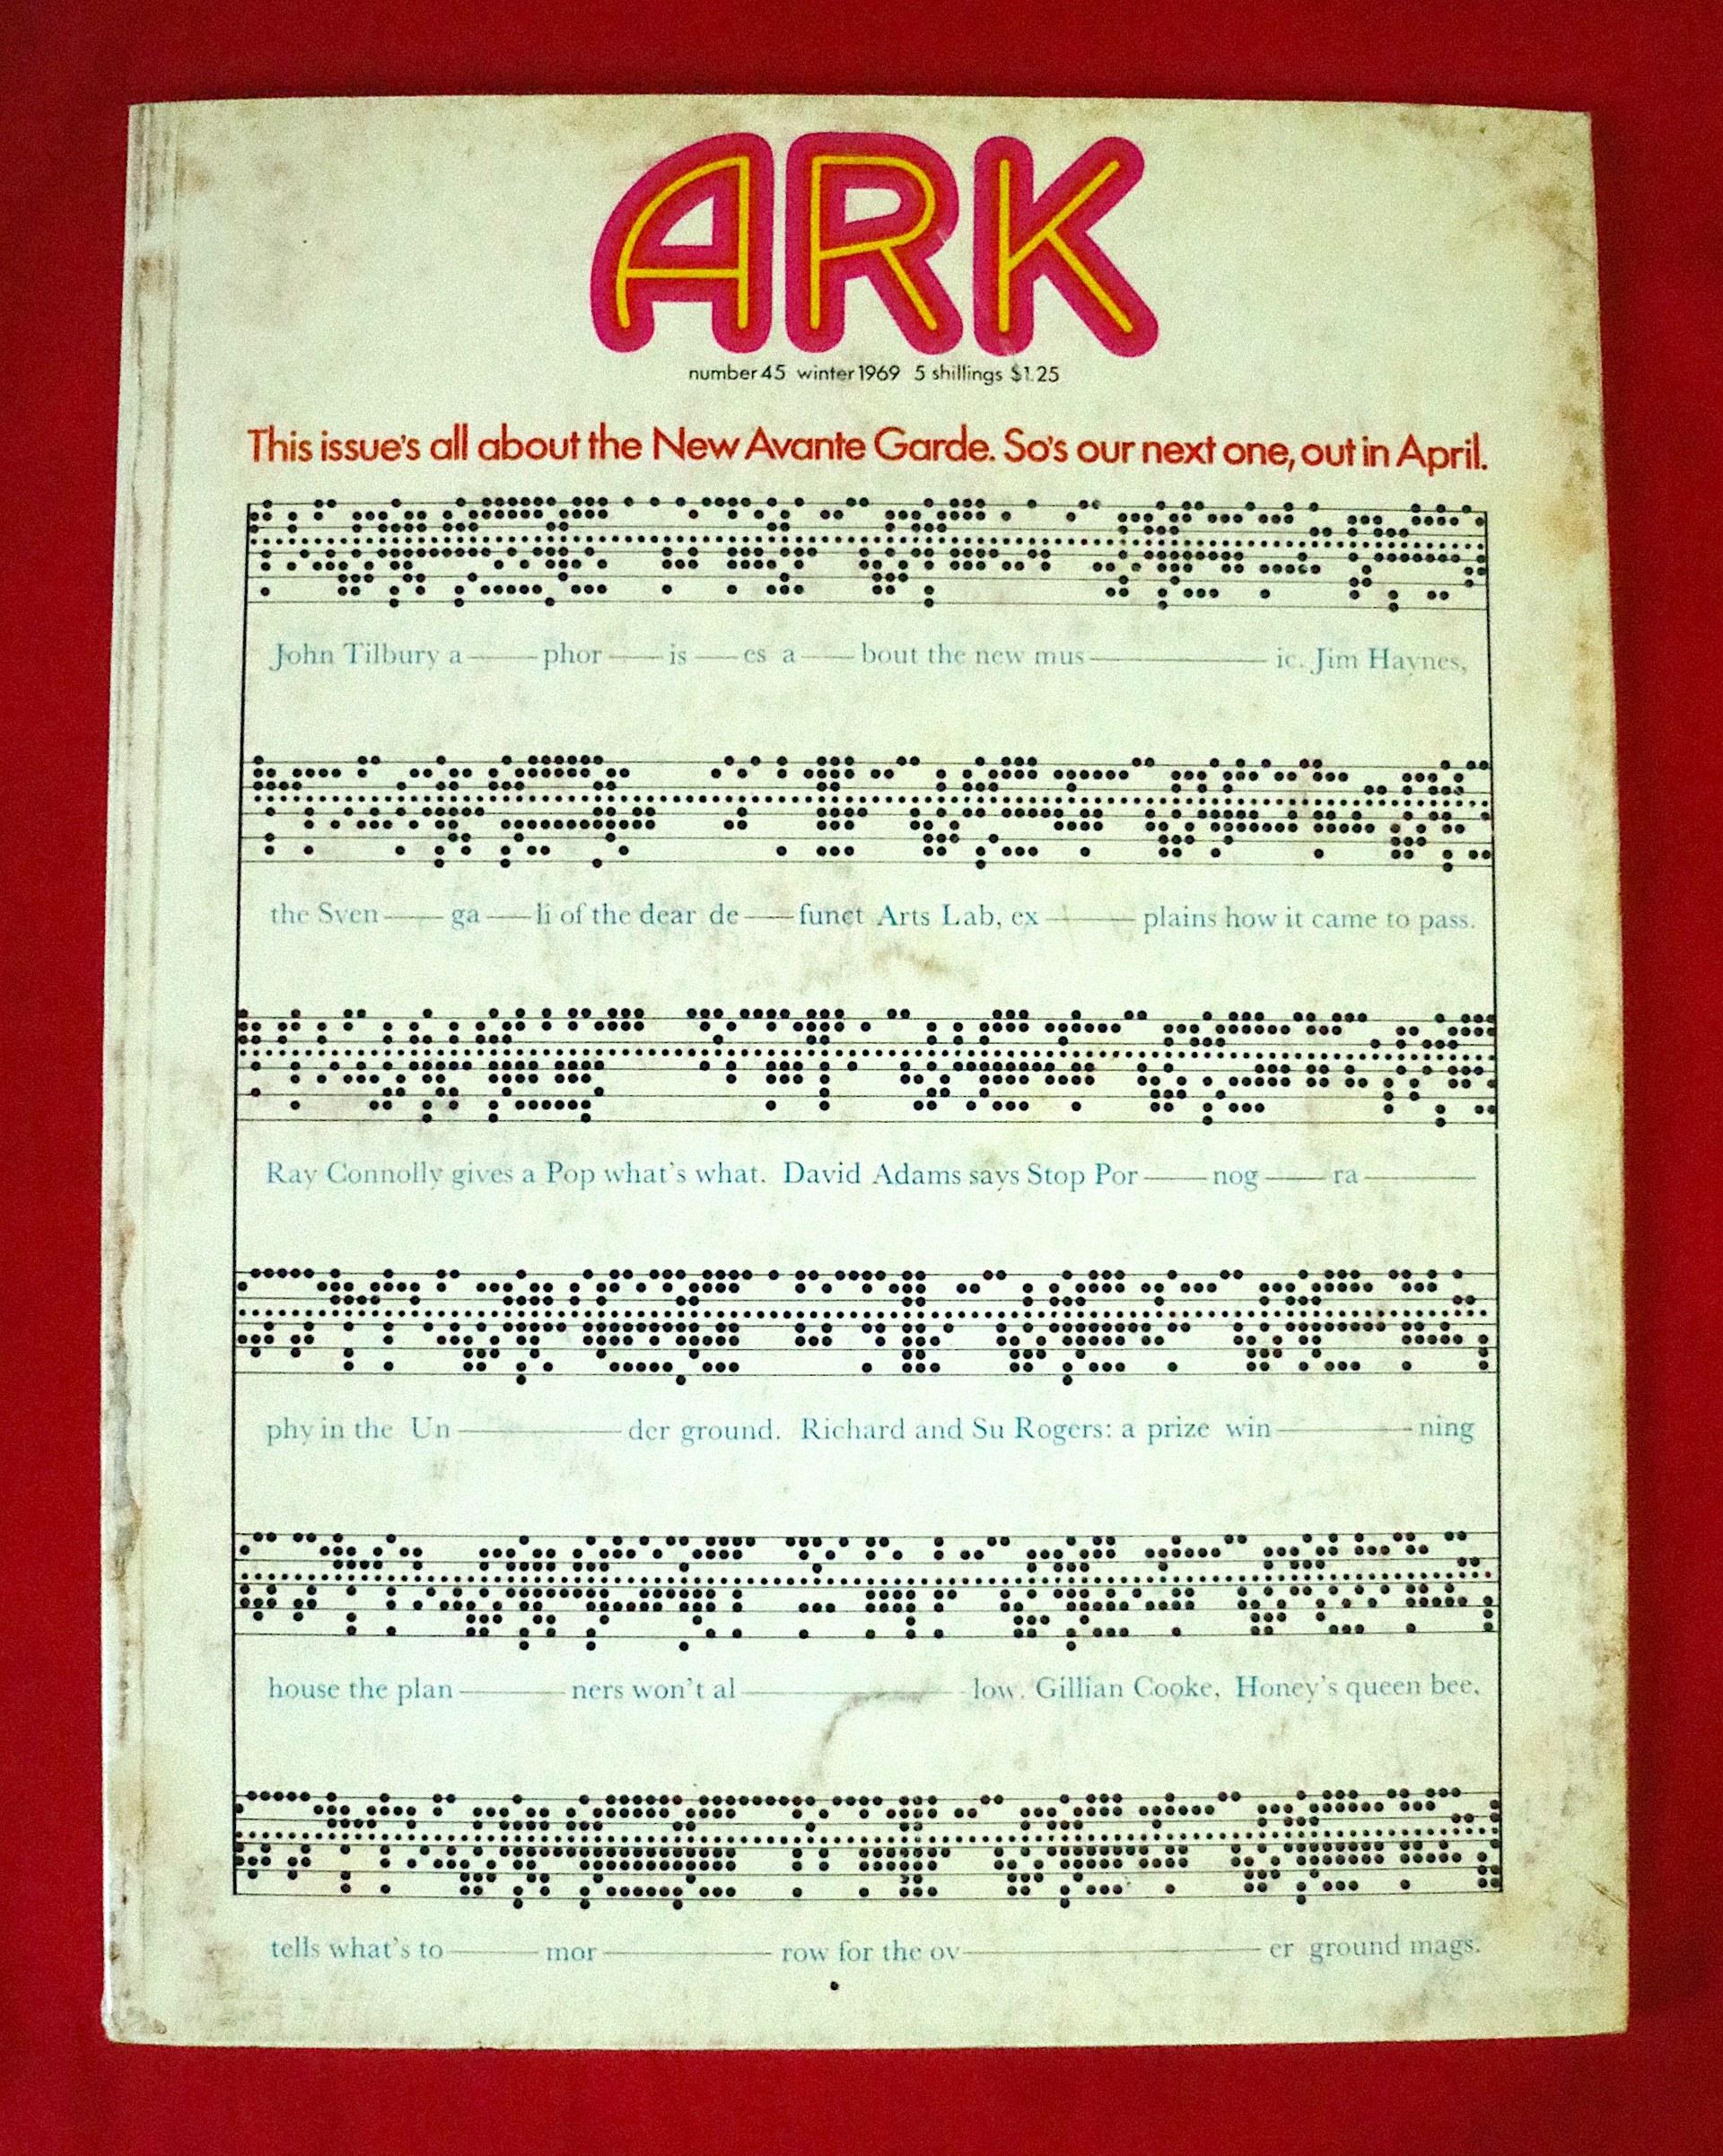 Ark 45 Winter 1969